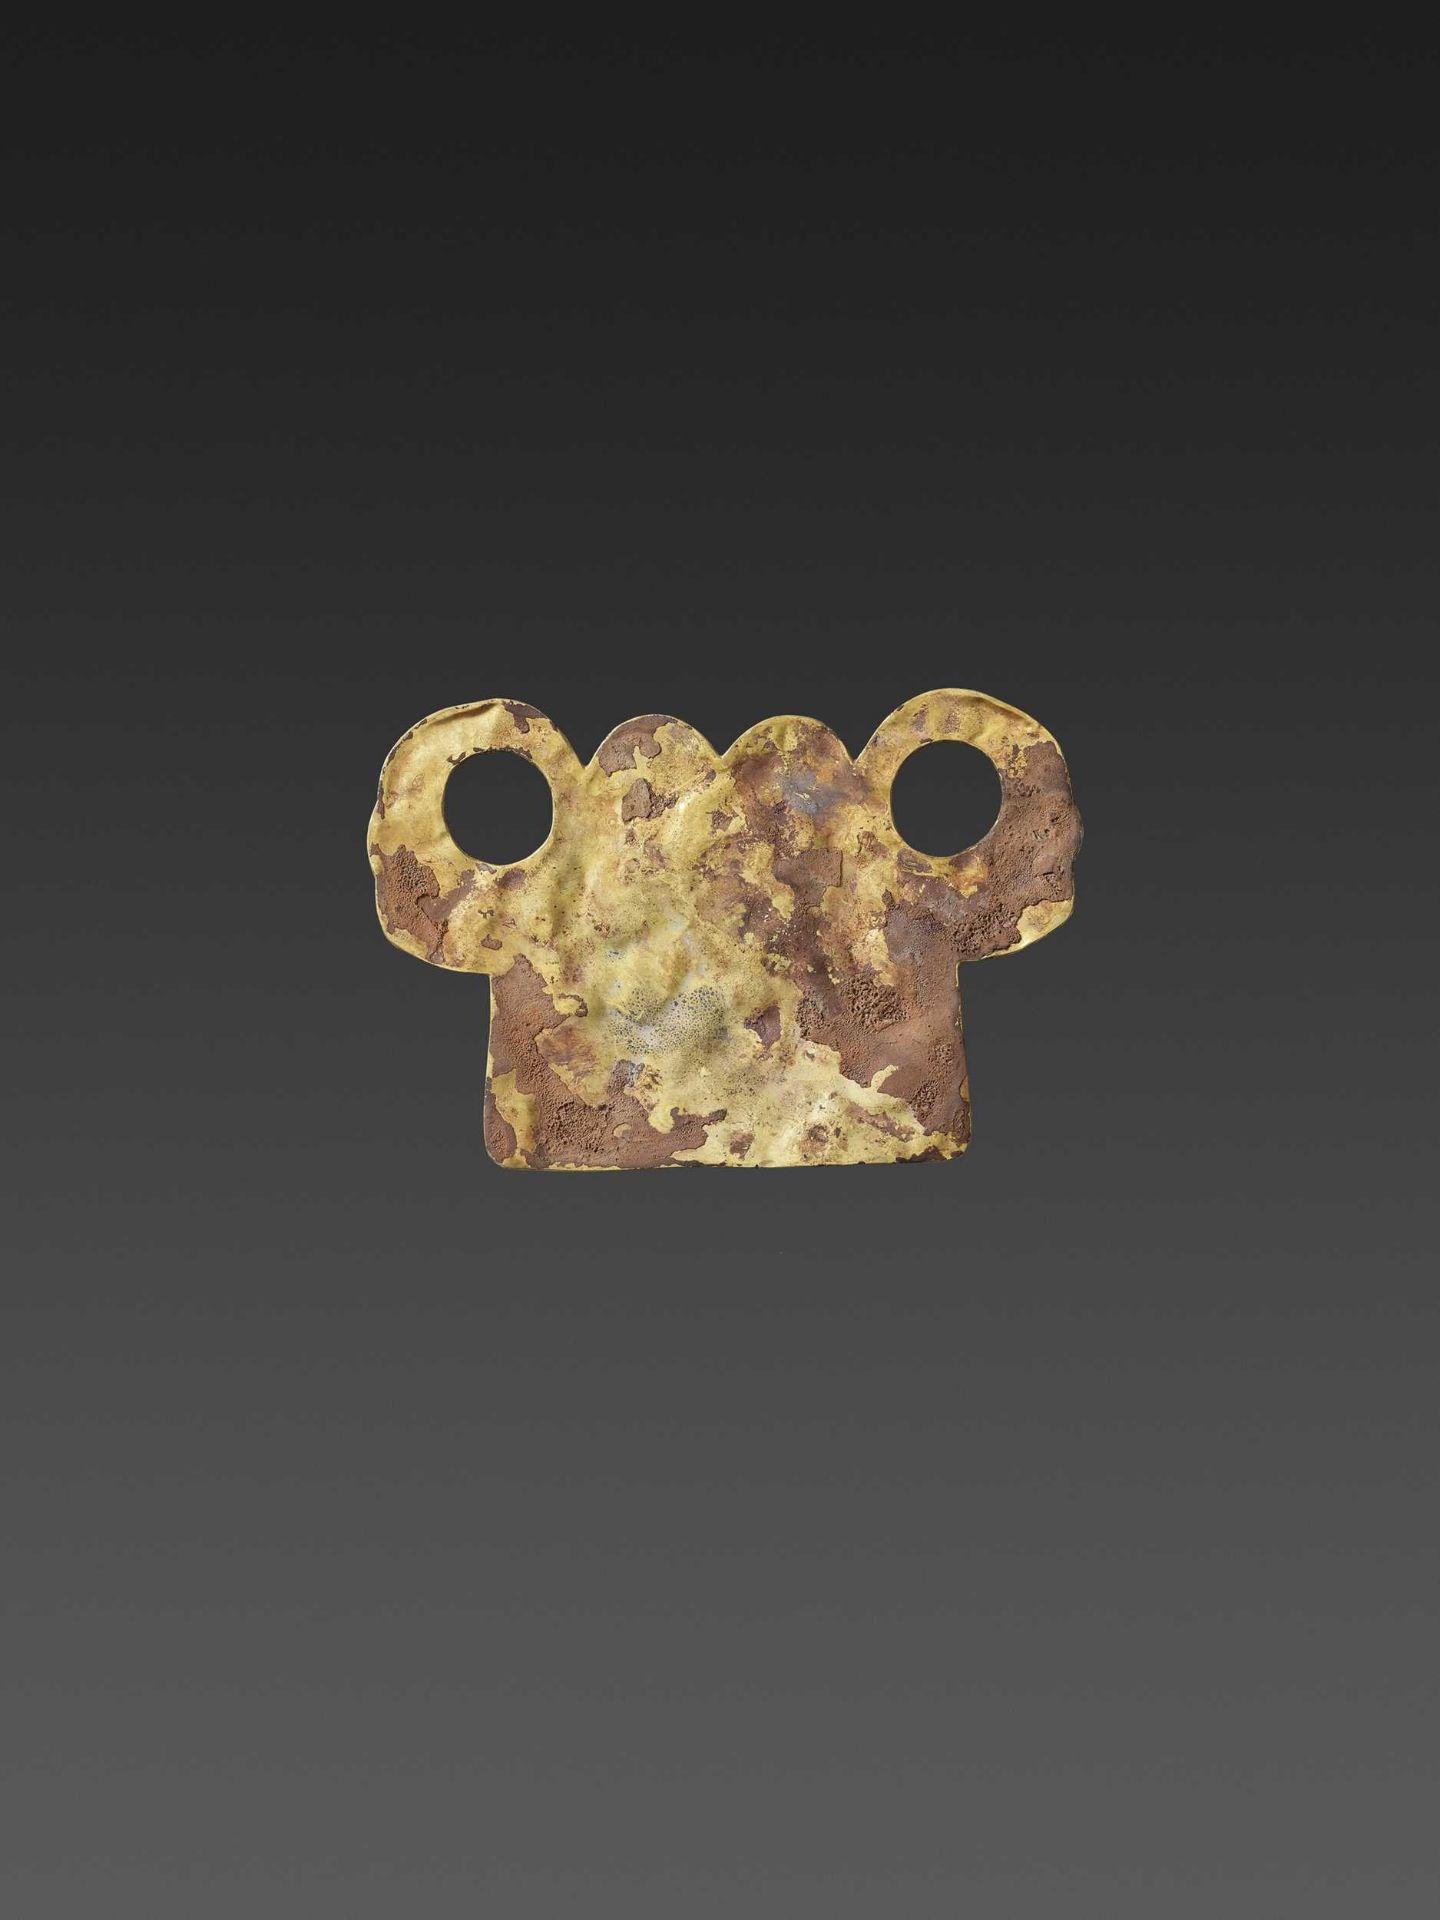 A CHAM ZIRCON AND AMETHYST-SET GOLD REPOUSSÉ PECTORAL DEPICTING NANDI AND NAGAS - Bild 4 aus 5